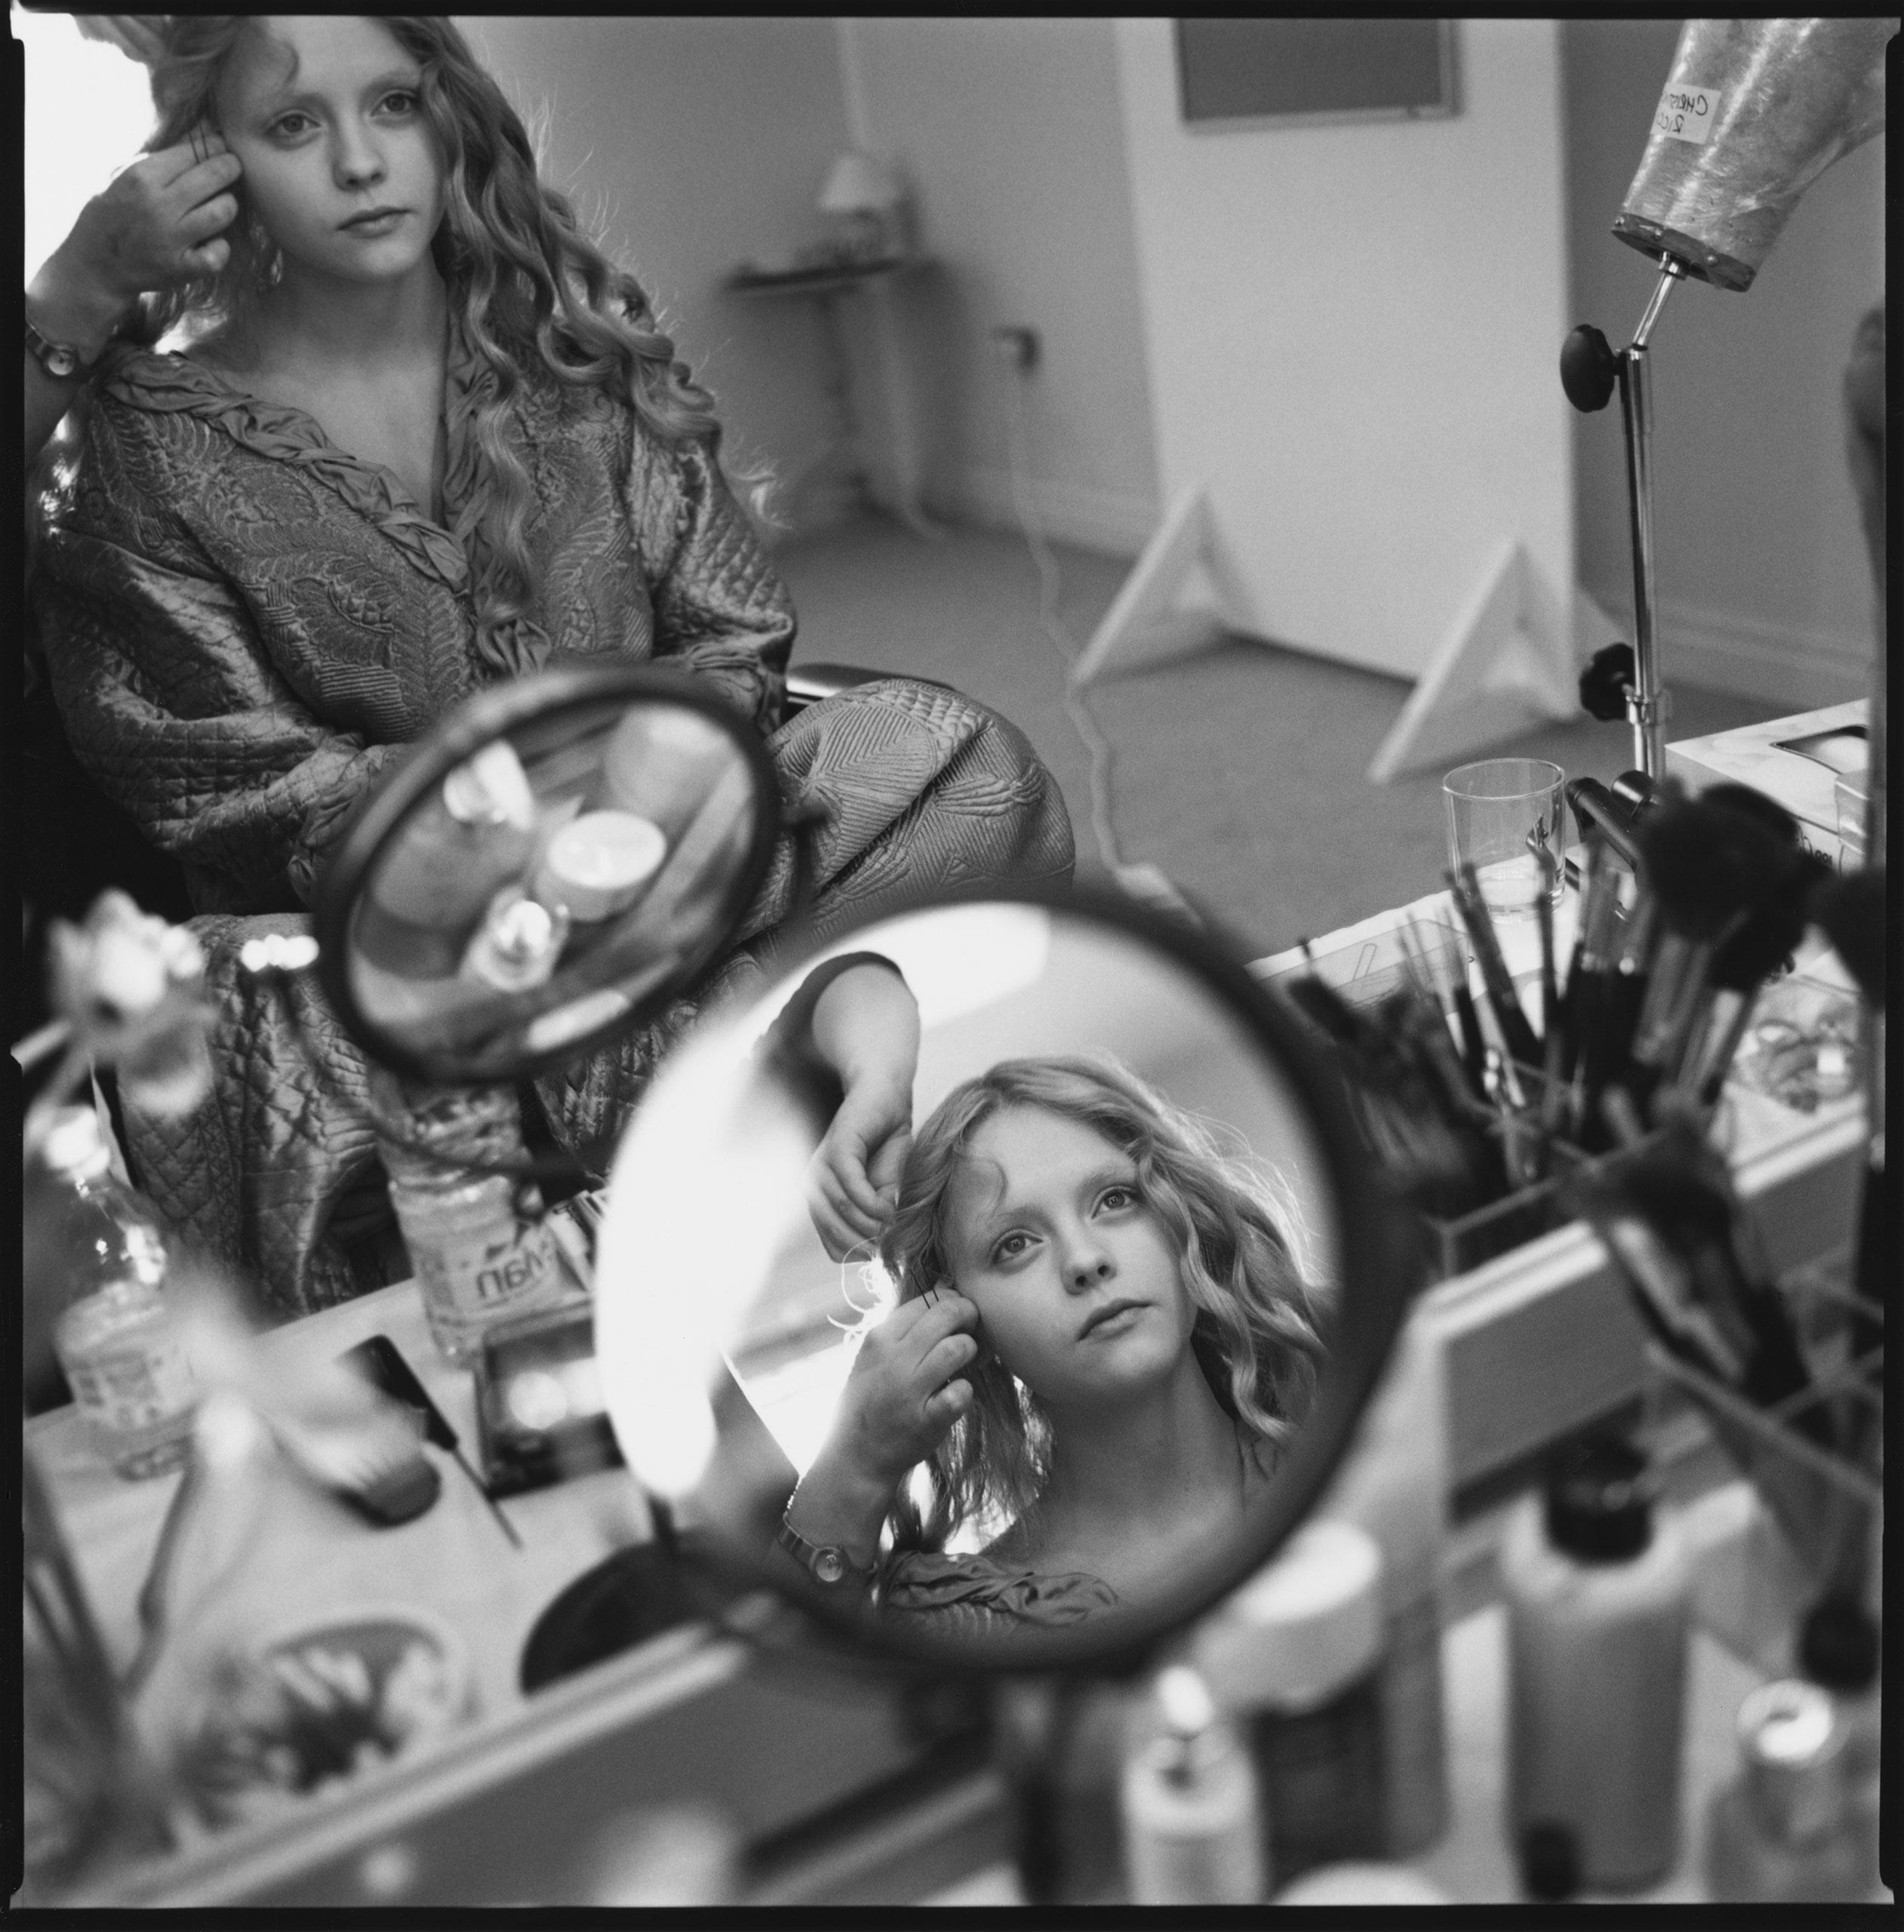 Christina Ricci in her dressing room for Sleepy Hollow. Shepperton Studios, England, 1999.